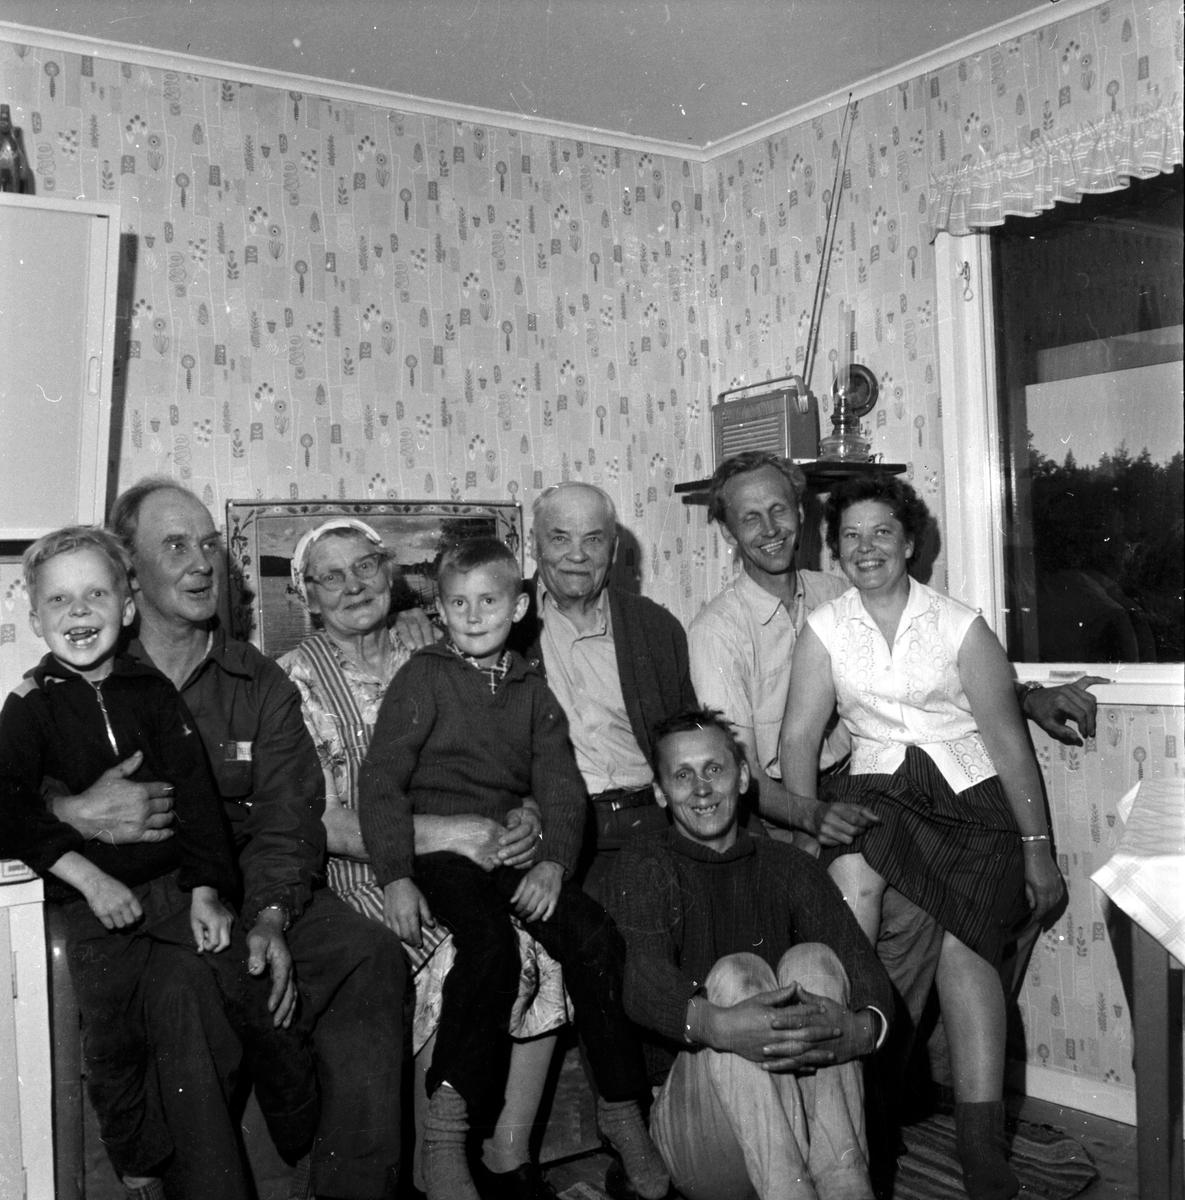 Flugbo, Lars o Johanna Eklund, 5 Juli 1961